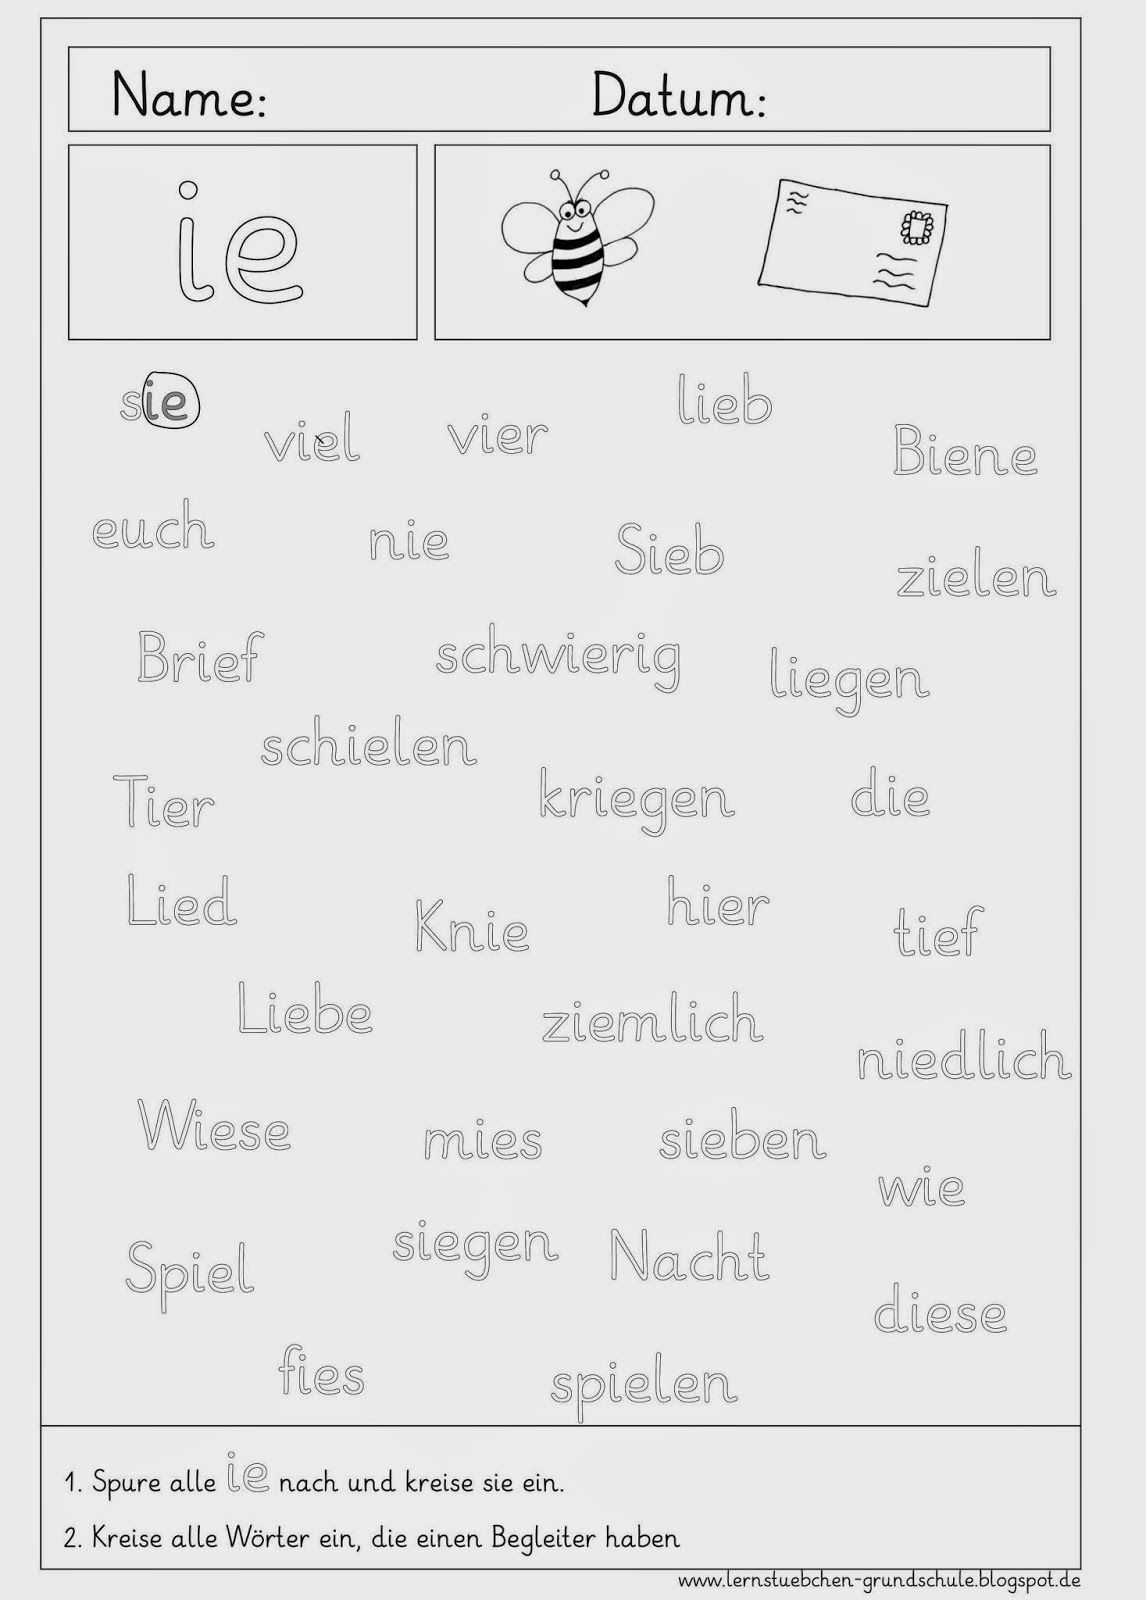 arbeitsbl tter rund um das ie schule grundschule arbeitsbl tter deutsch und deutsch unterricht. Black Bedroom Furniture Sets. Home Design Ideas